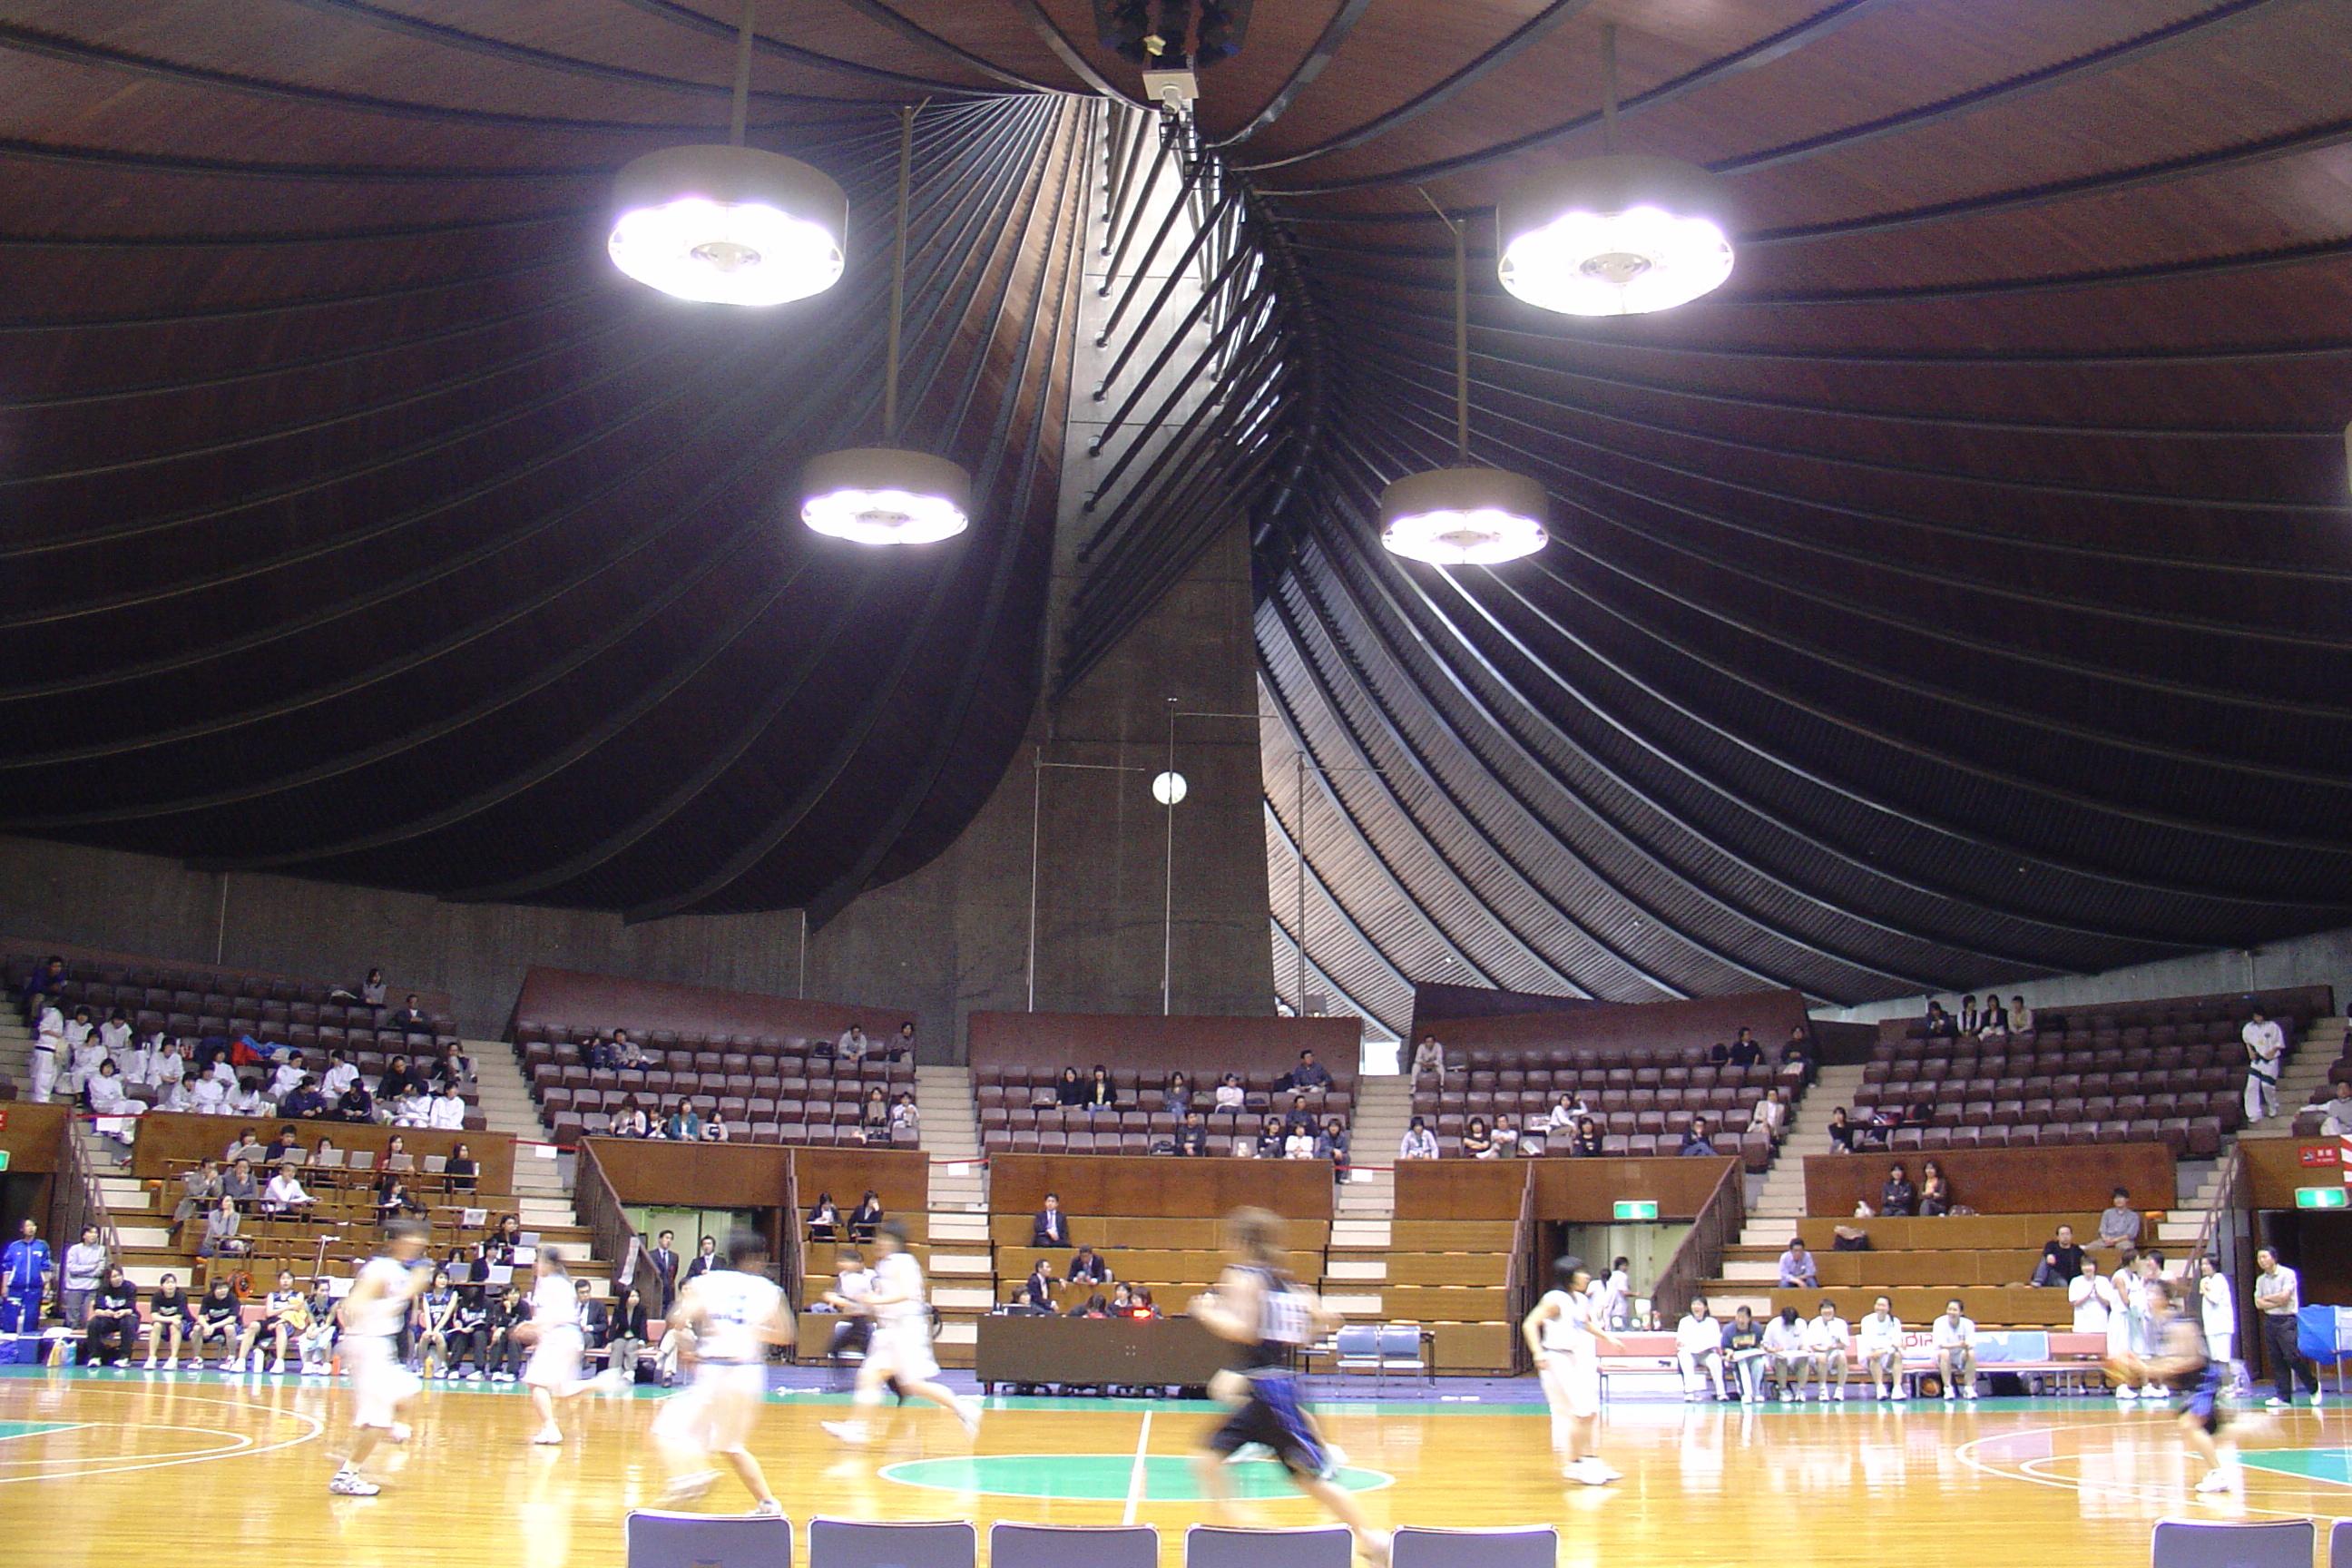 Les Gymnases olympiques de Yoyogi